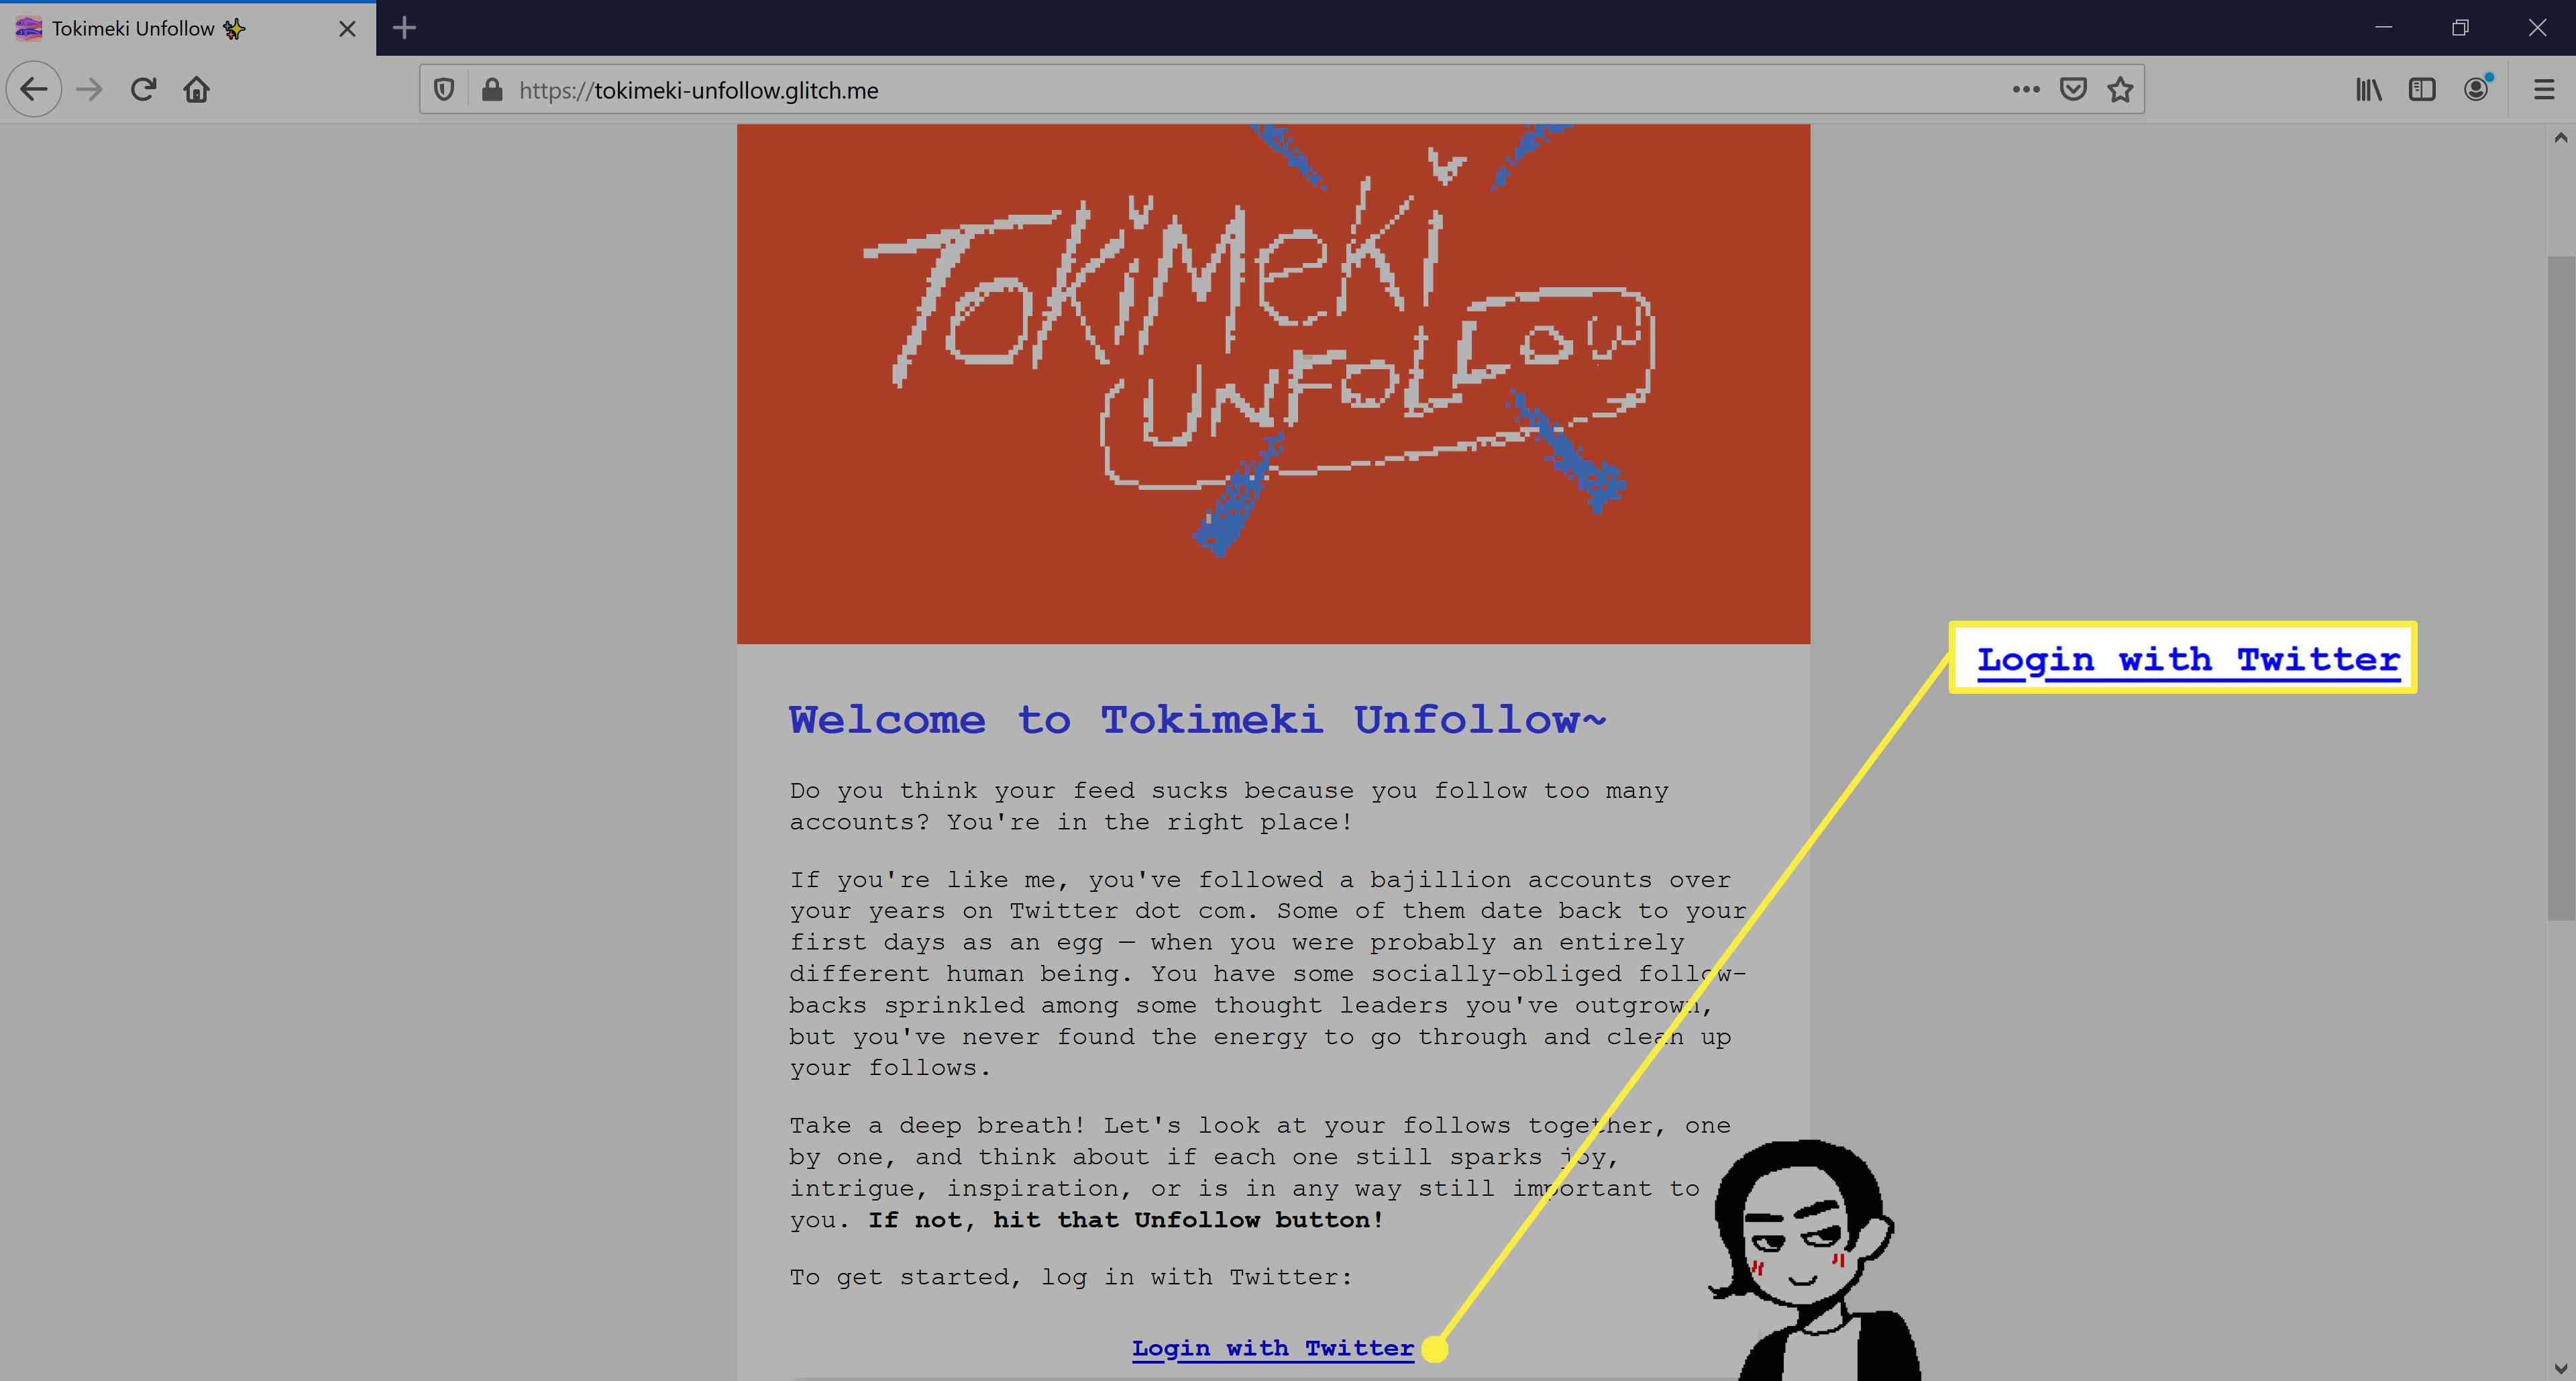 Logging into Twitter via the Tokimeki Unfollow tool.